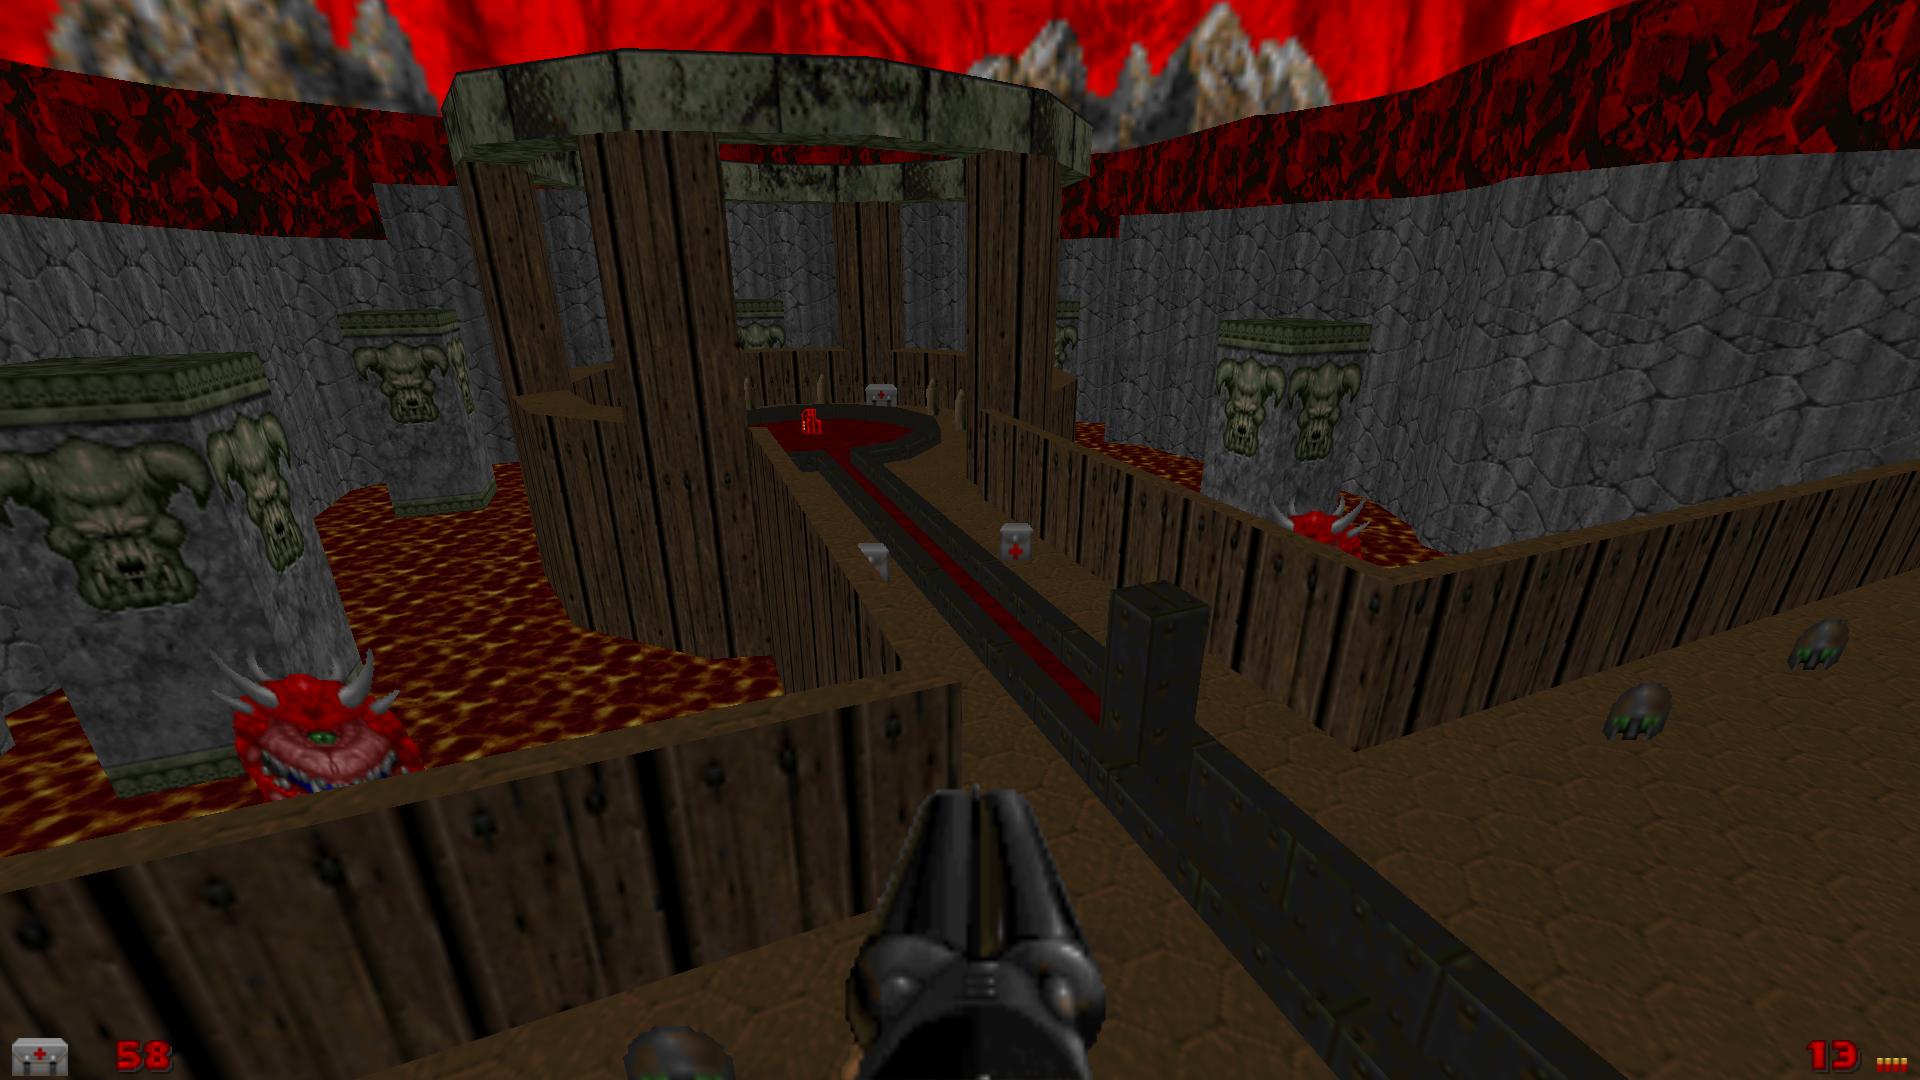 Screenshot_Doom_20201017_121922.png.bbb9aa03d6d462b6d6ffd00b6e954476.png